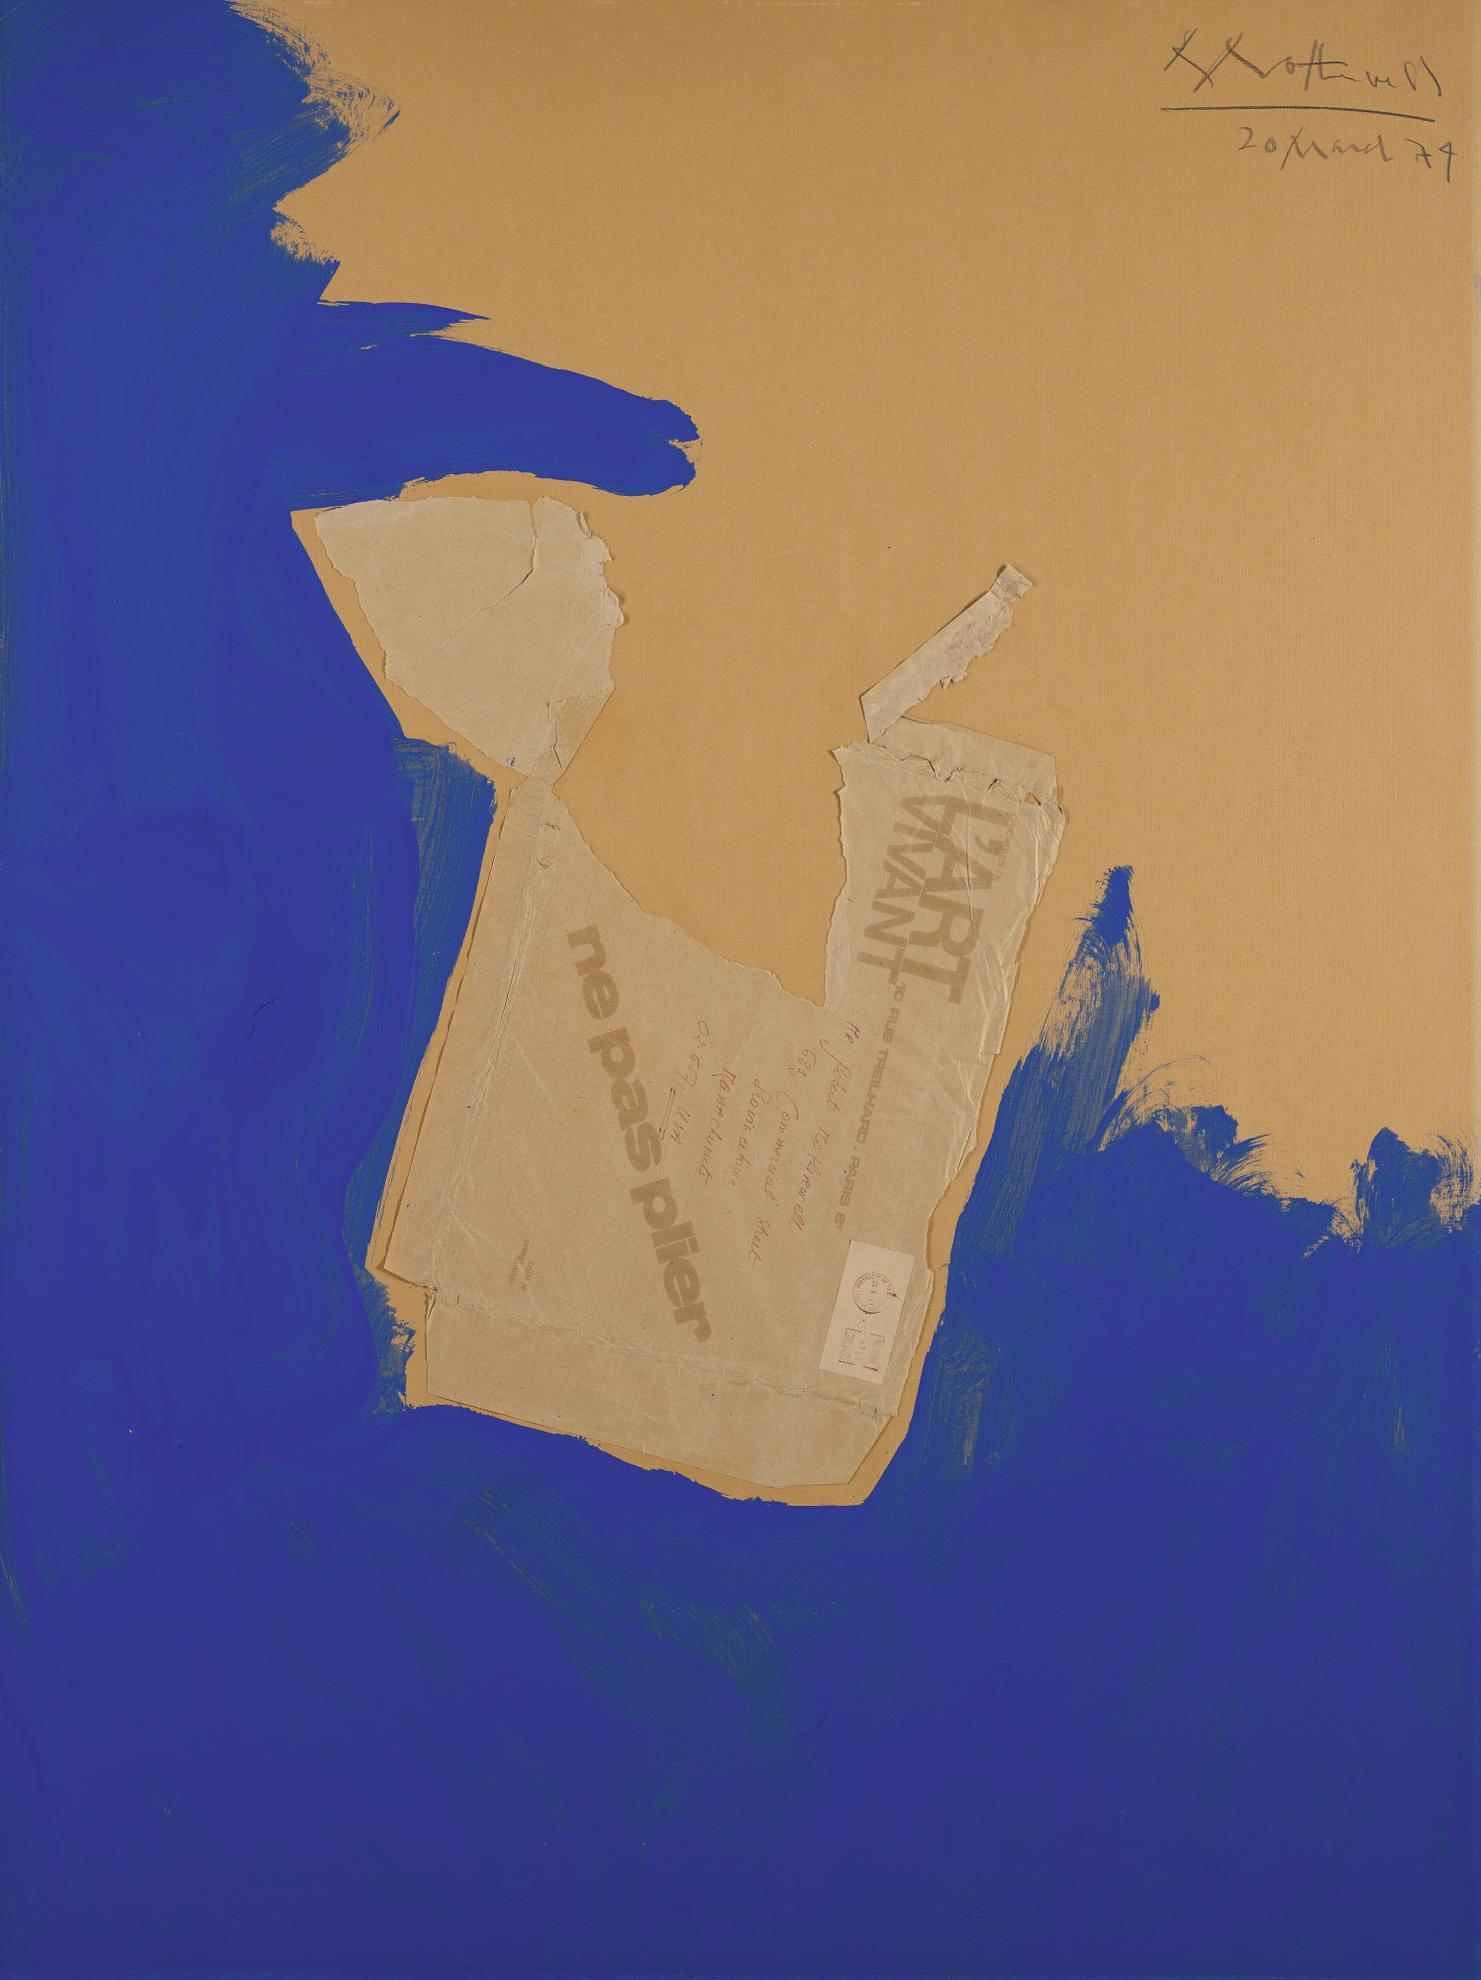 Robert Motherwell-The Baltic Sea Bride No. II-1974